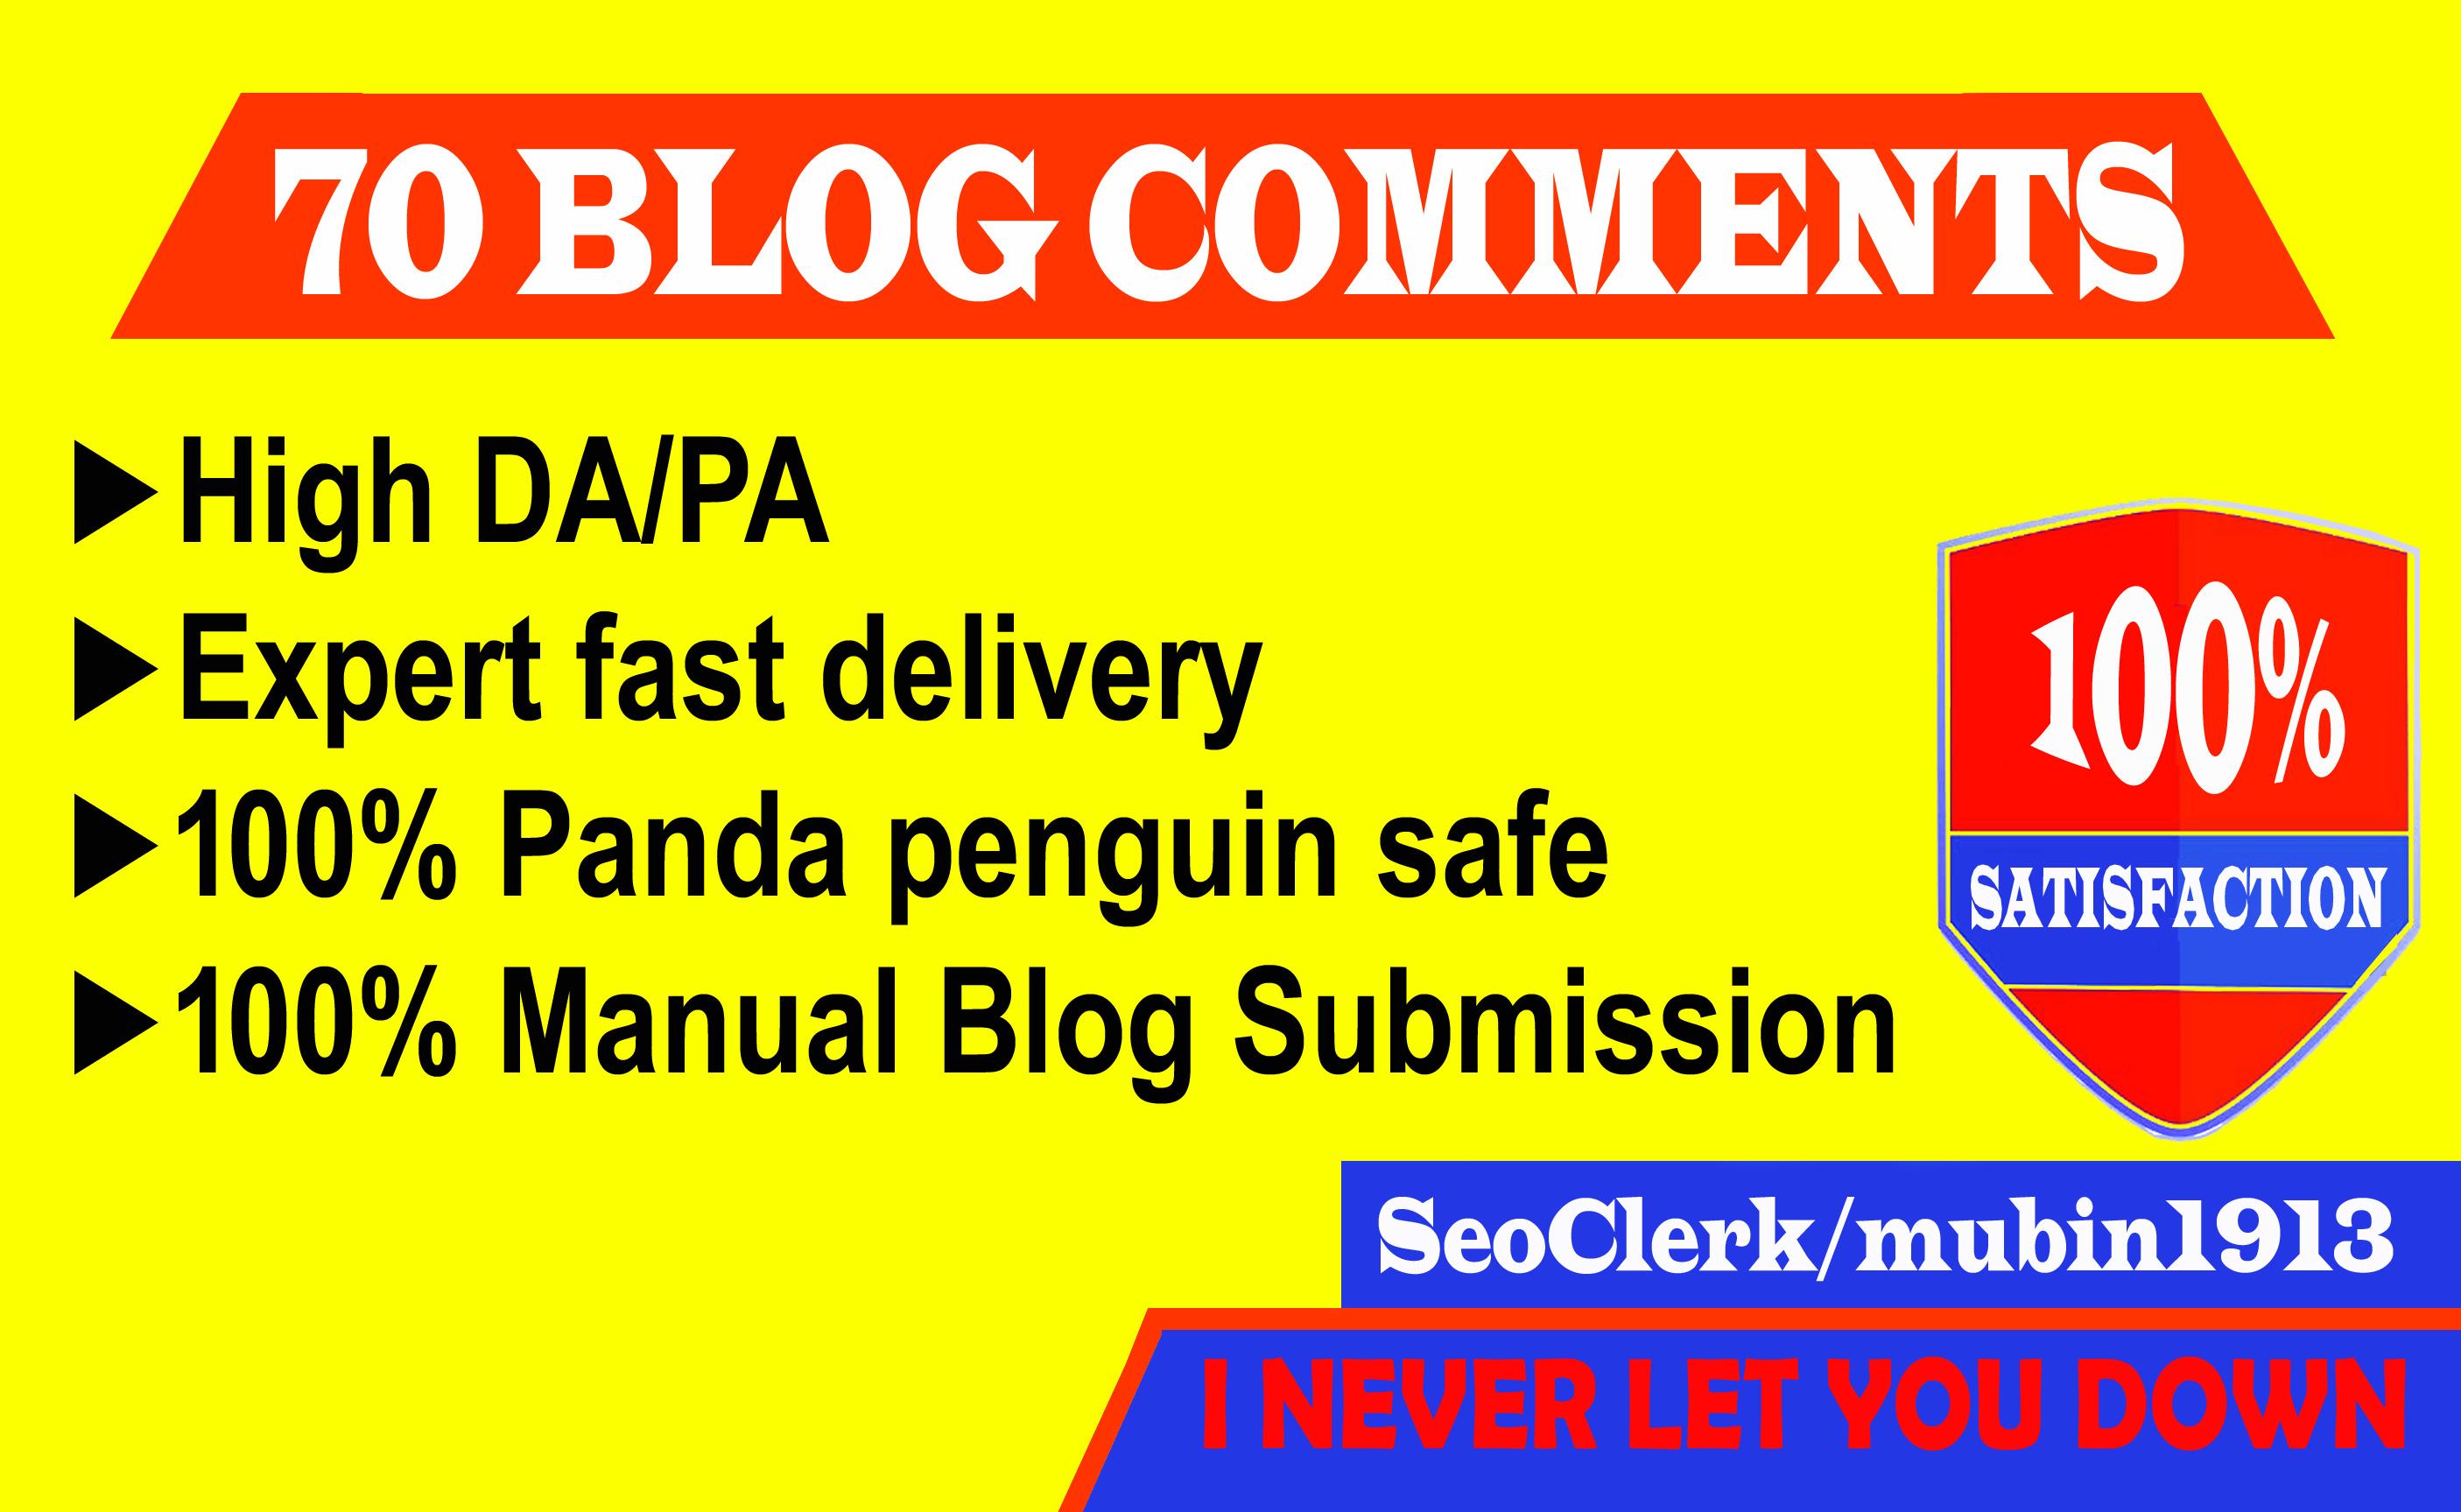 Create 70 Blog Comments on High DA Blog